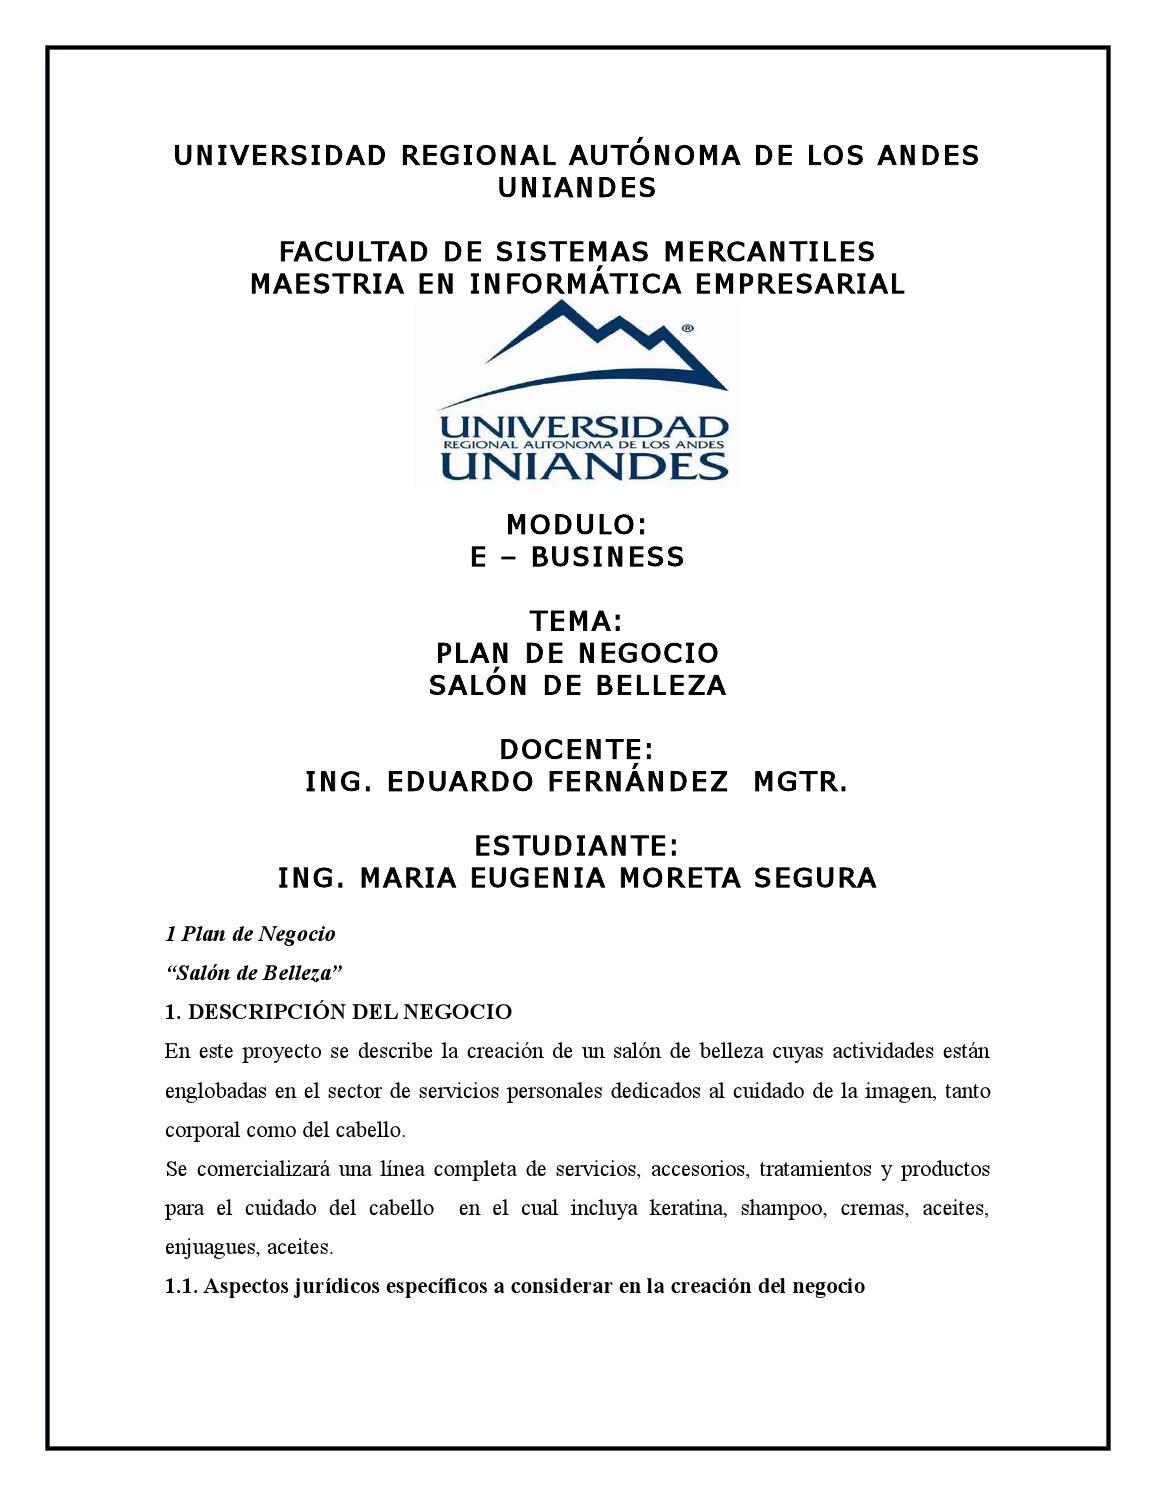 Plan de negocio salon de belleza by Maria Eugenia Moreta Segura - issuu